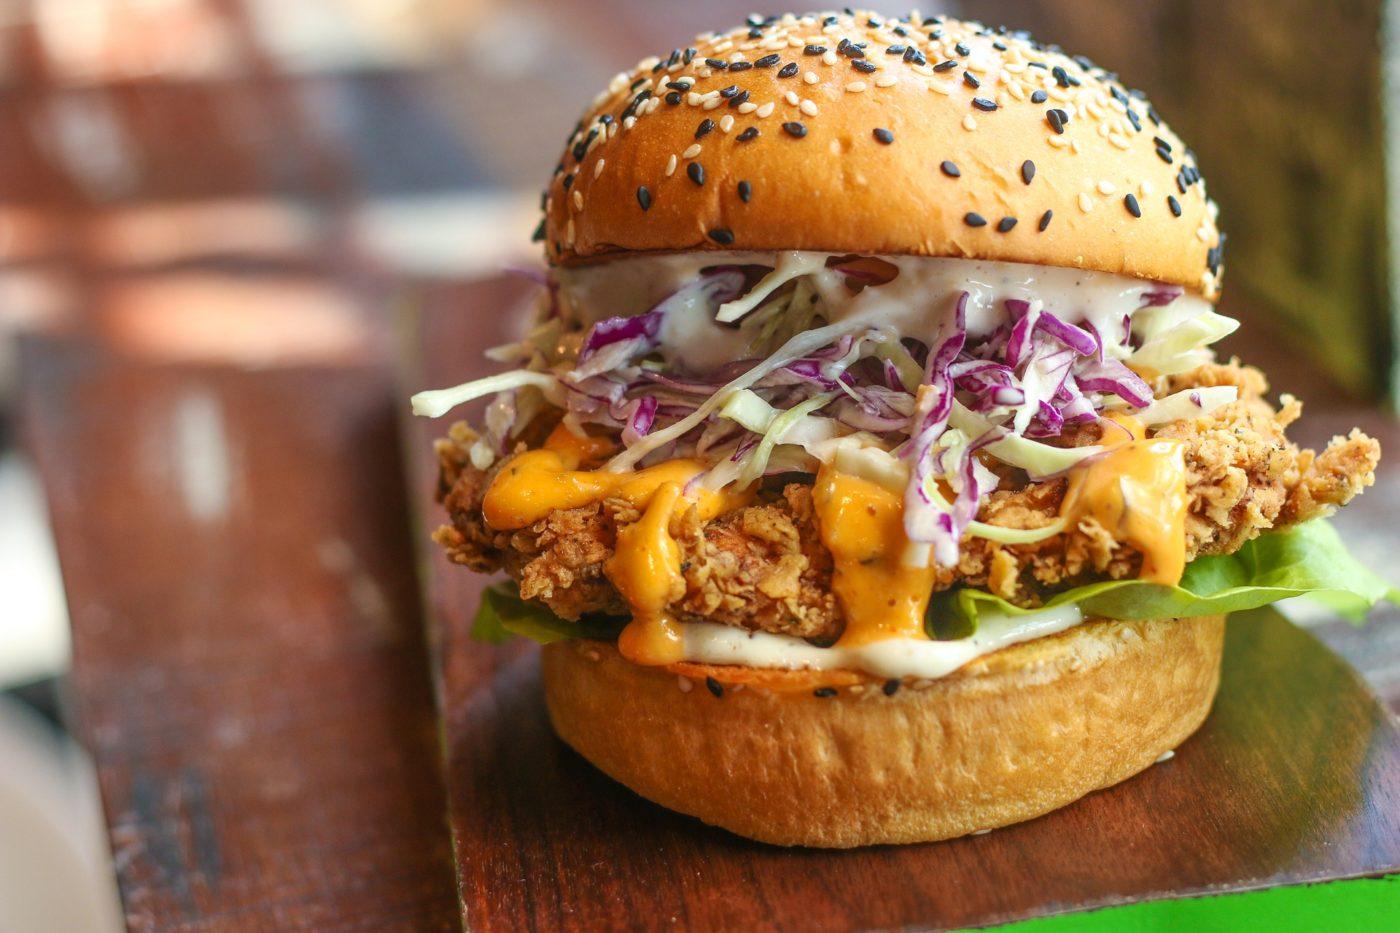 chicken burger 2953388 1920 - Fast Food Battles: Pakistan's Crispy Chicken Burgers